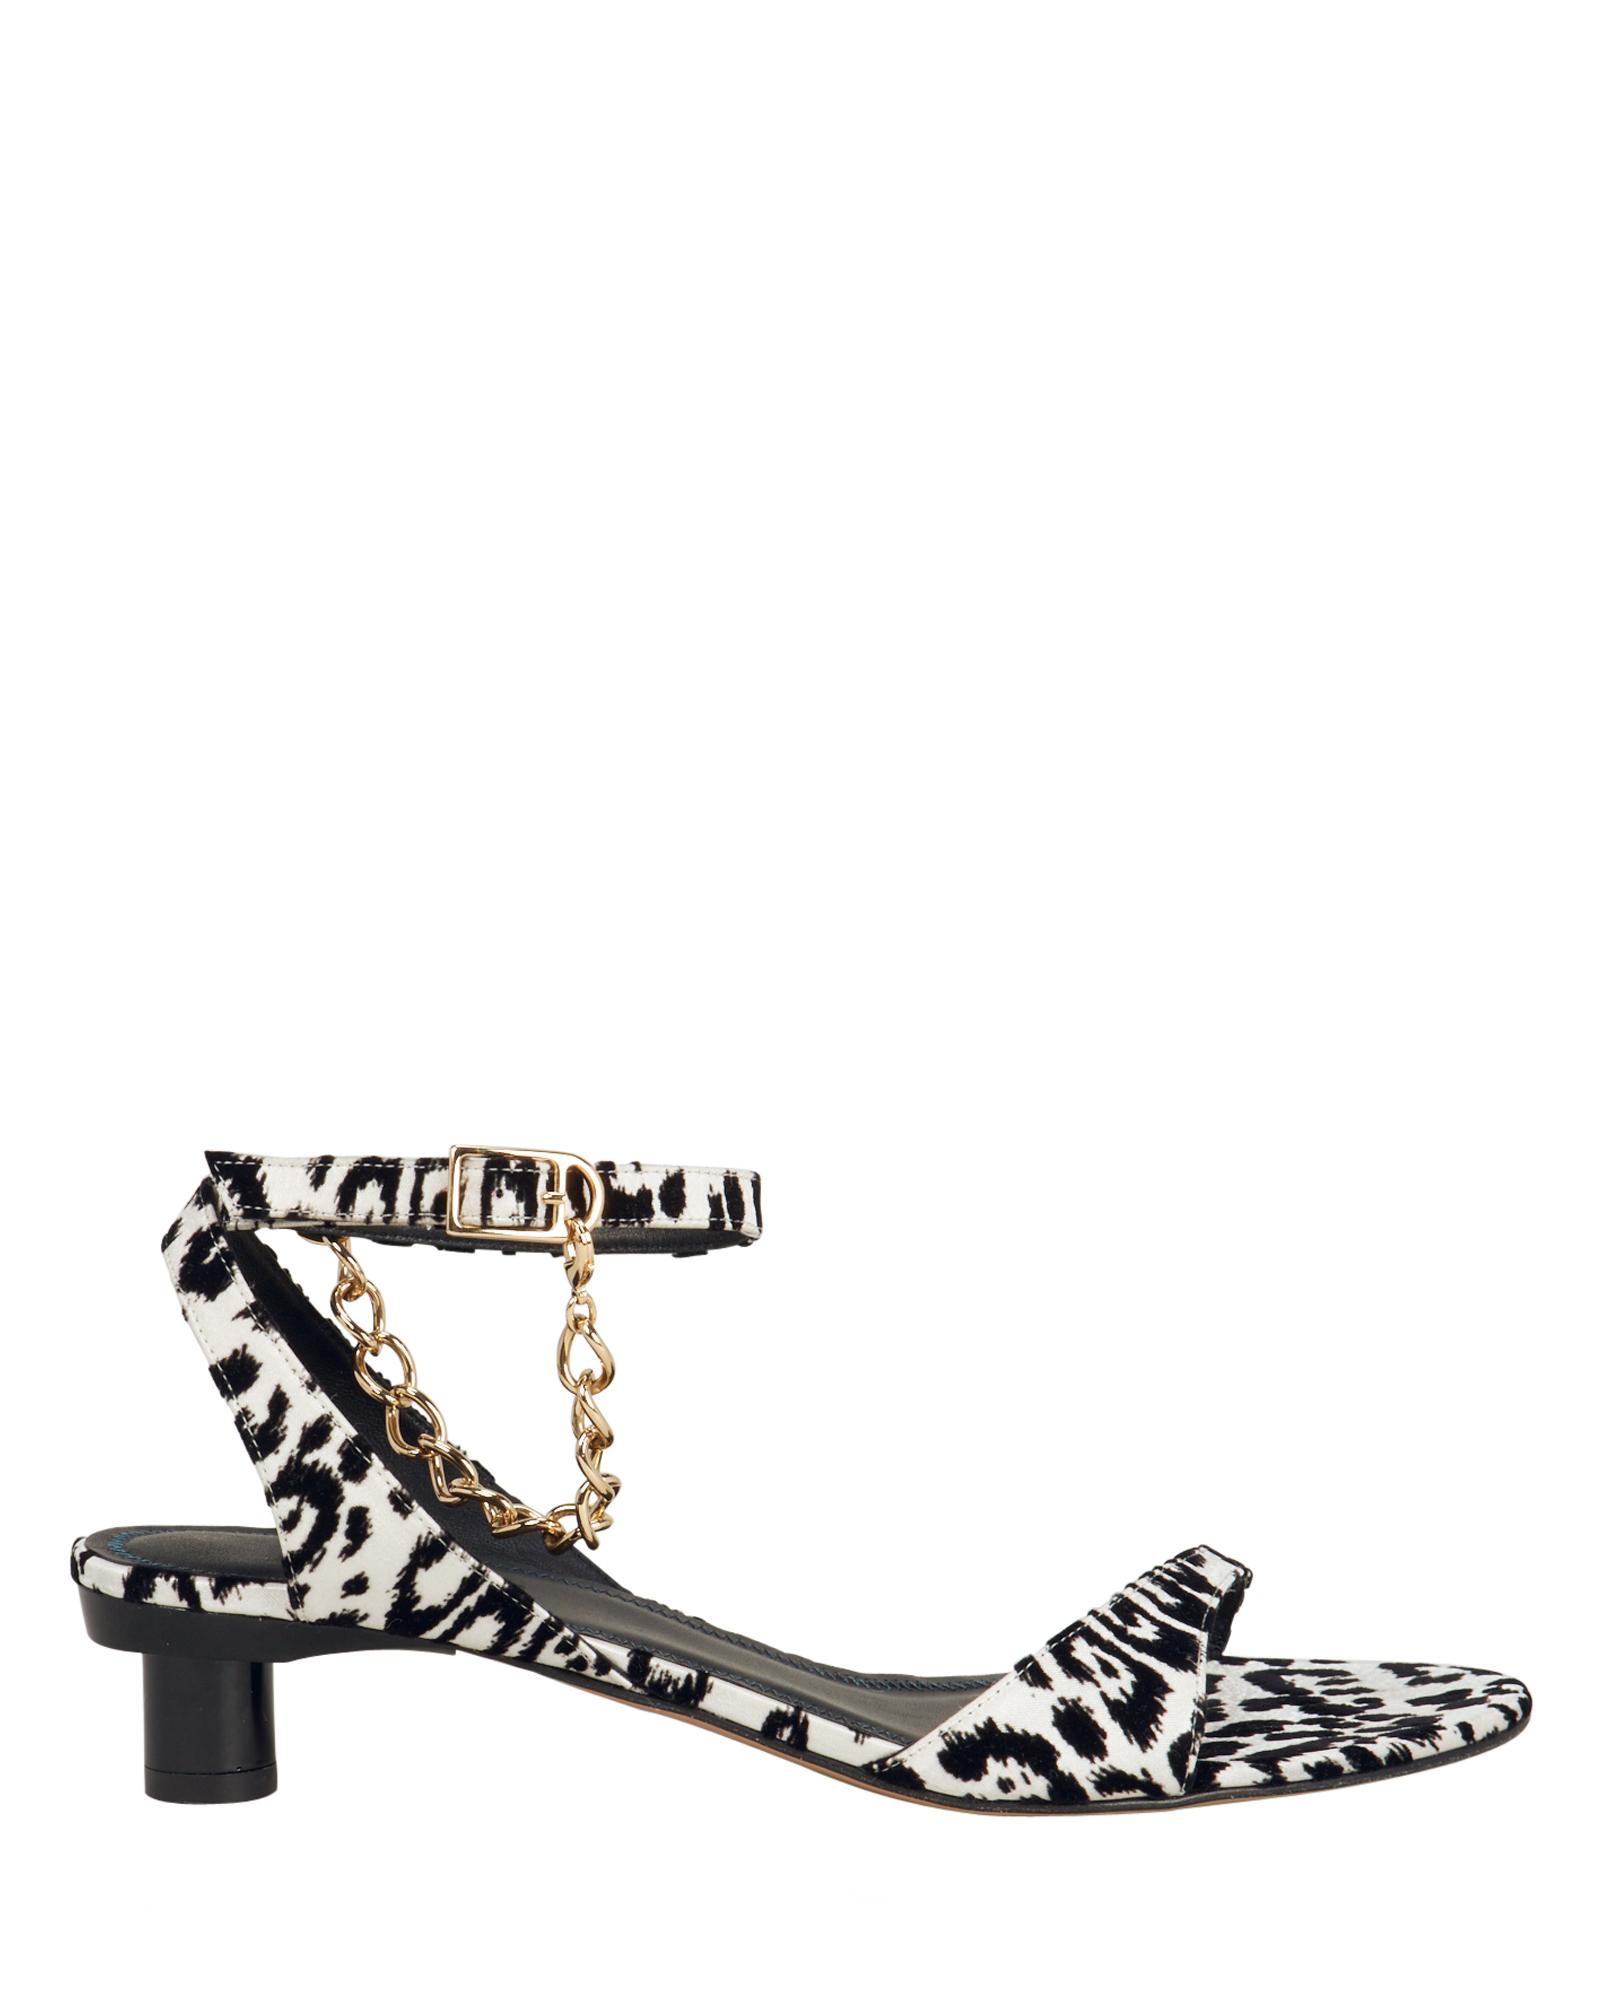 Nathan Dalmatian Chain Kitten Heels by Tibi